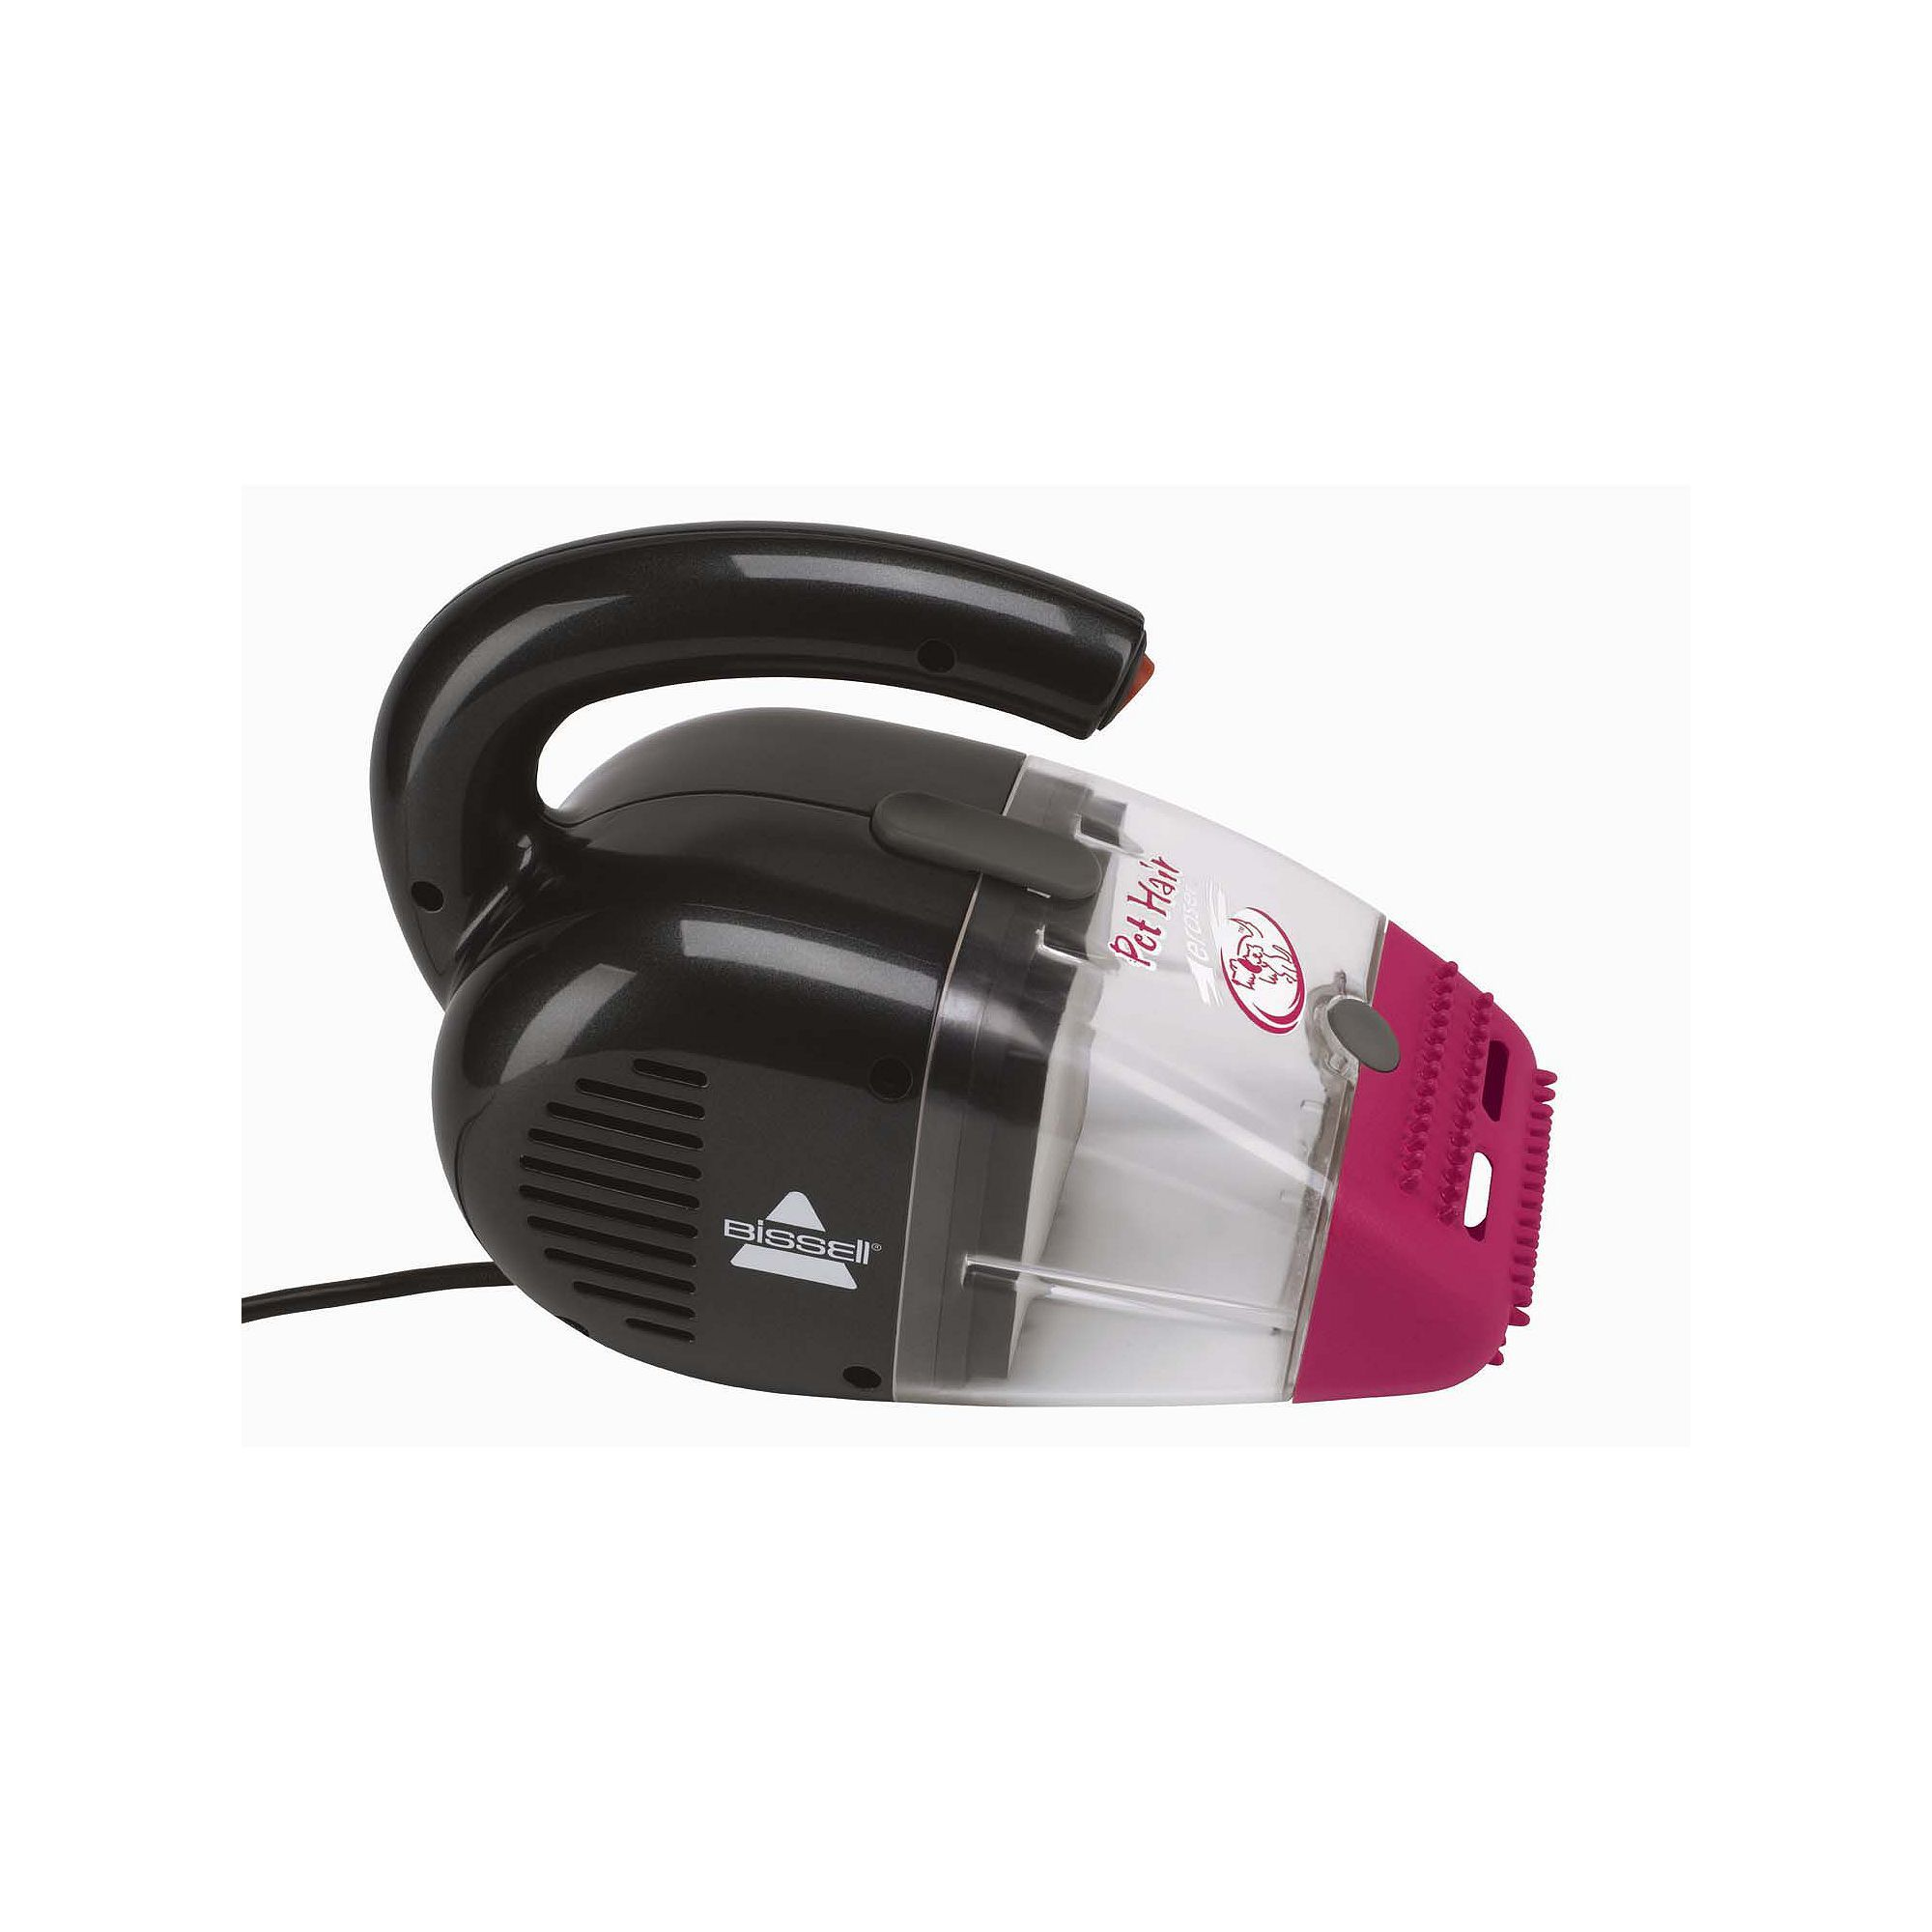 33A1 Bissell Pet Hair Eraser Handheld Vacuum Corded